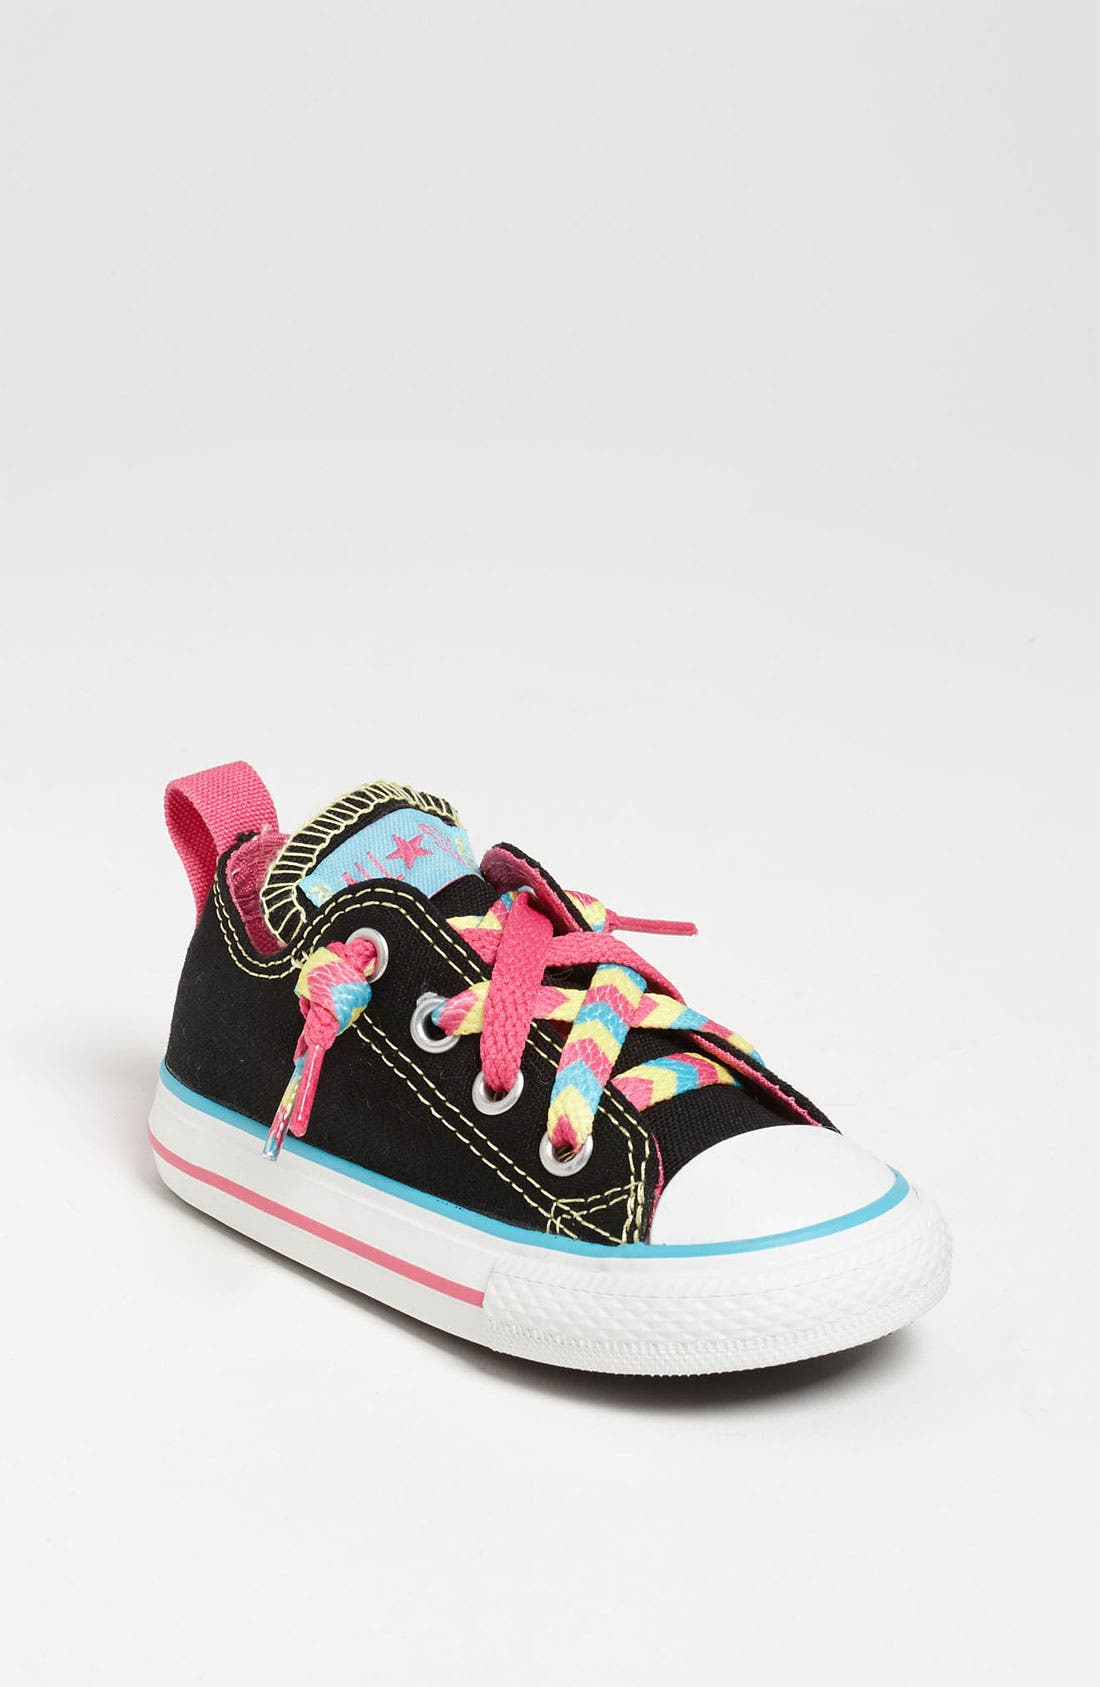 Main Image - Converse Chuck Taylor® All Star® 'Kriss N Kross' Sneaker (Baby, Walker & Toddler)